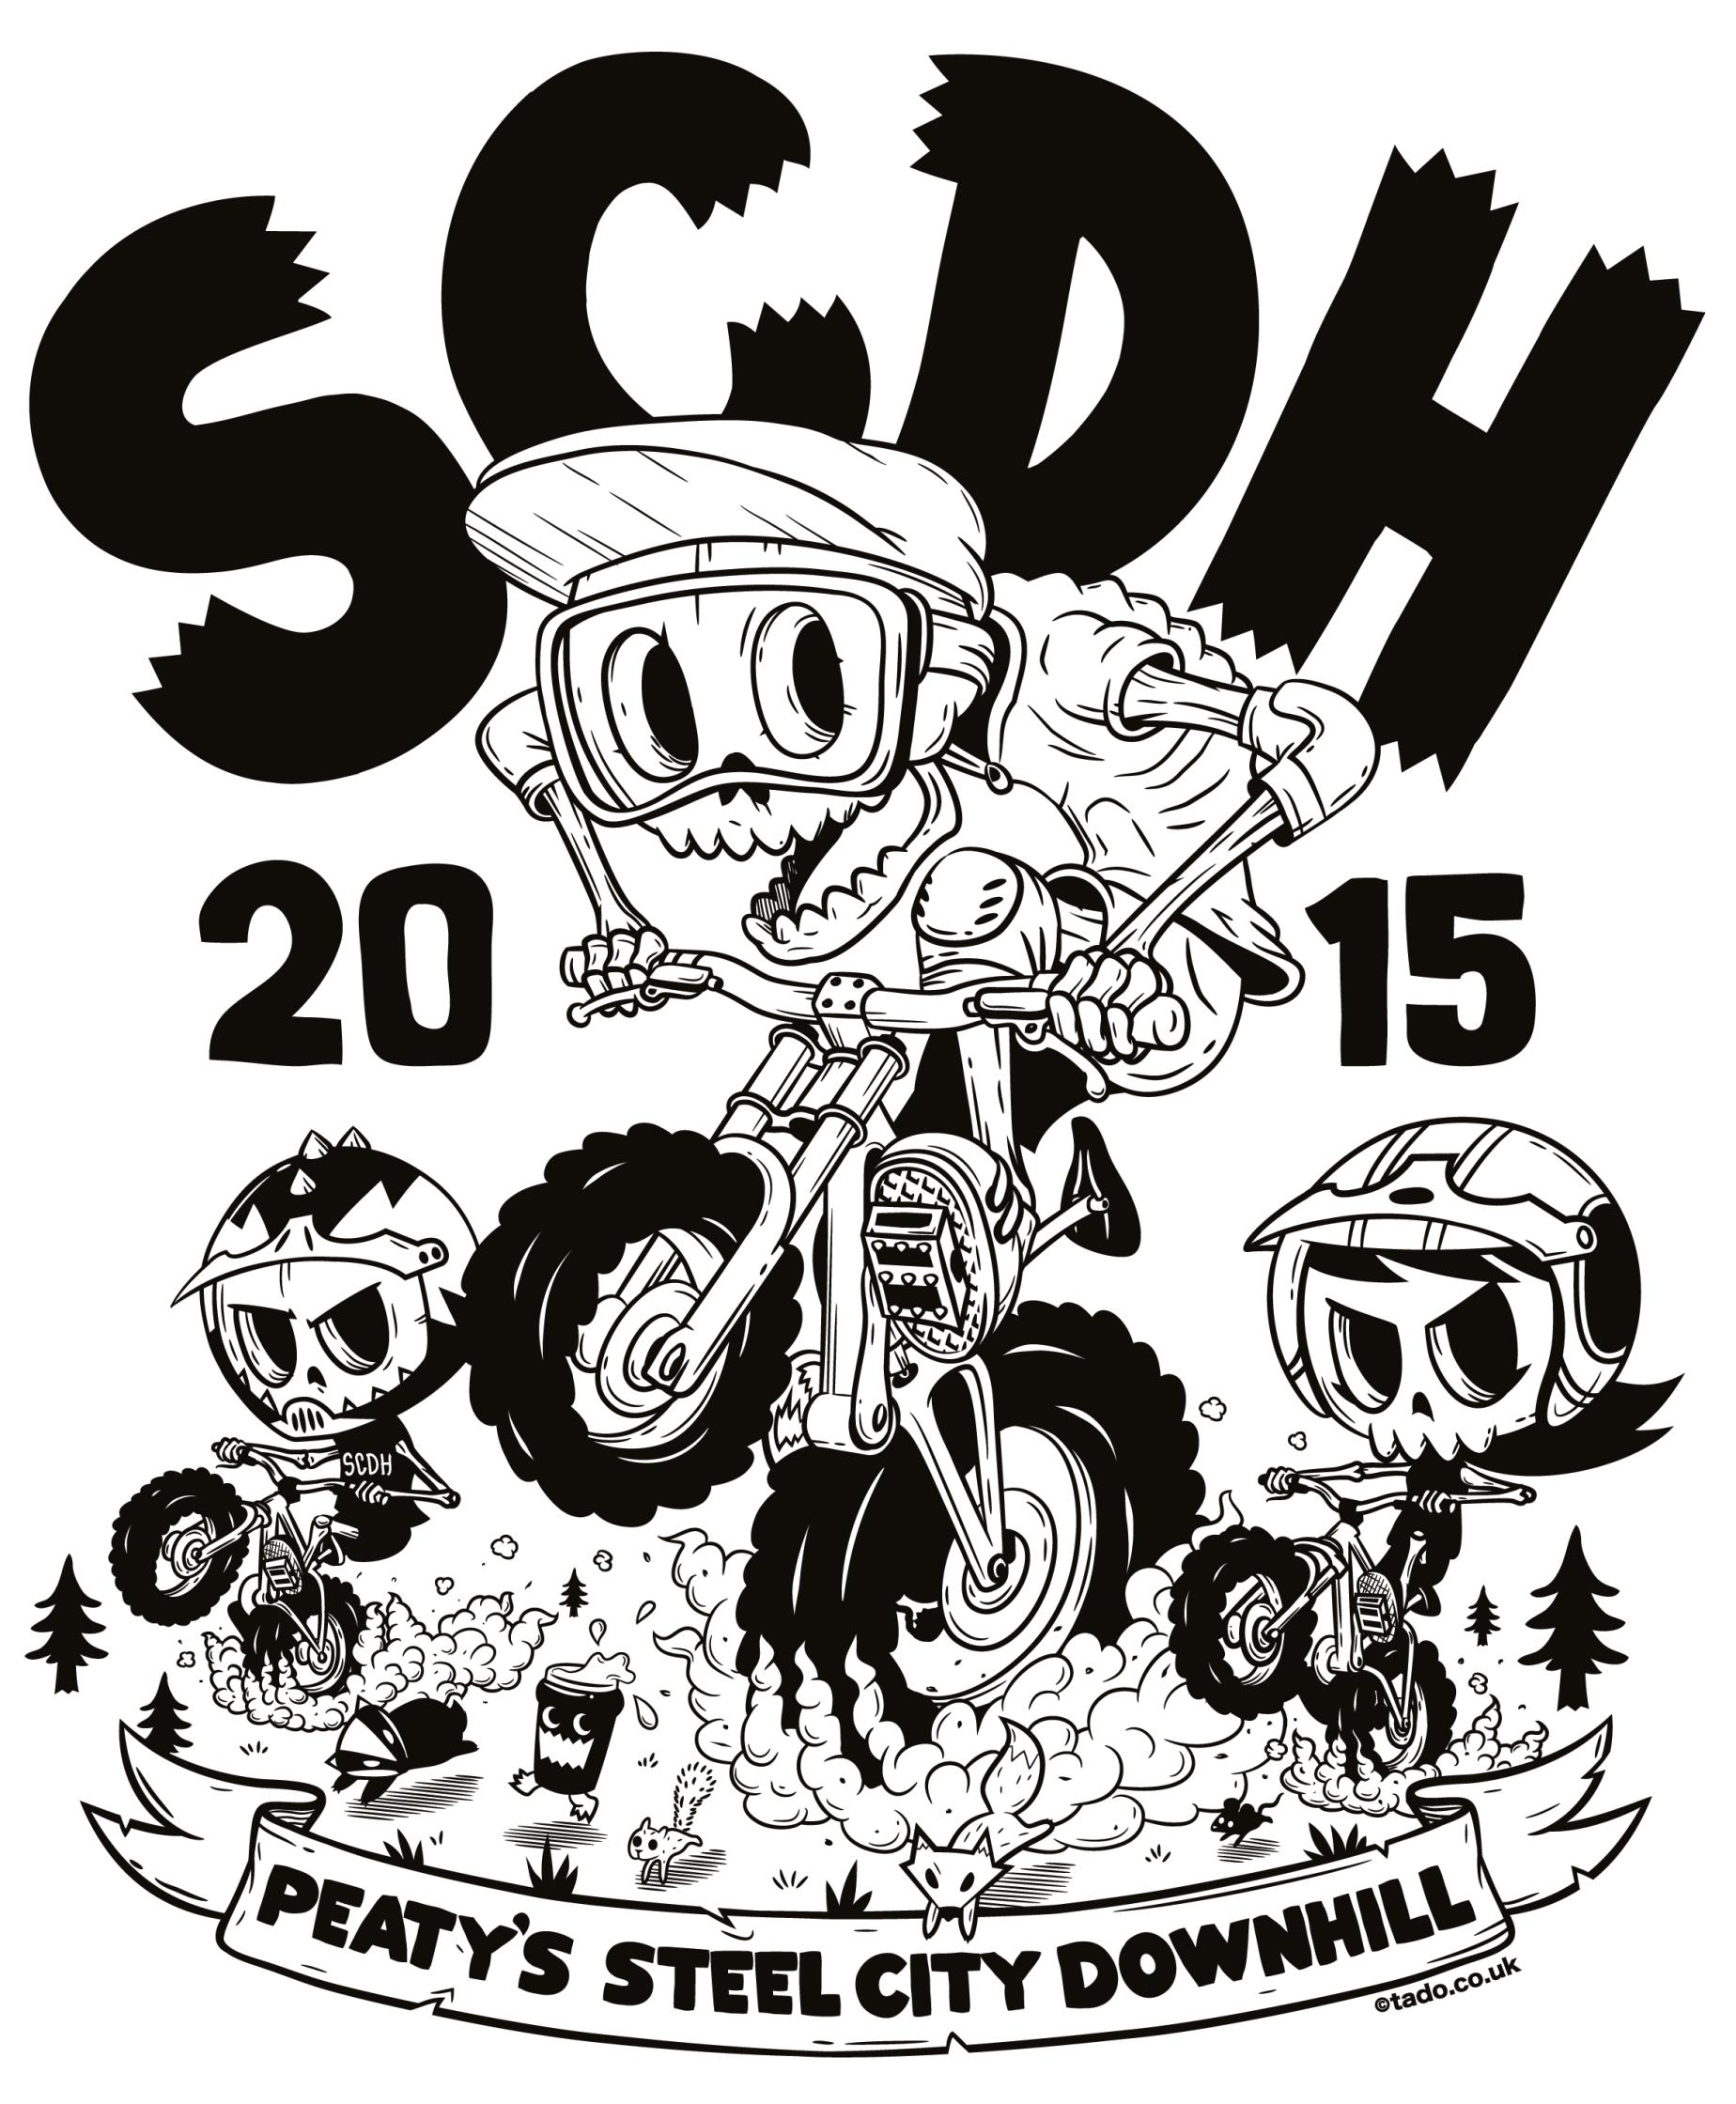 Peaty's Steel City Downhill 2015